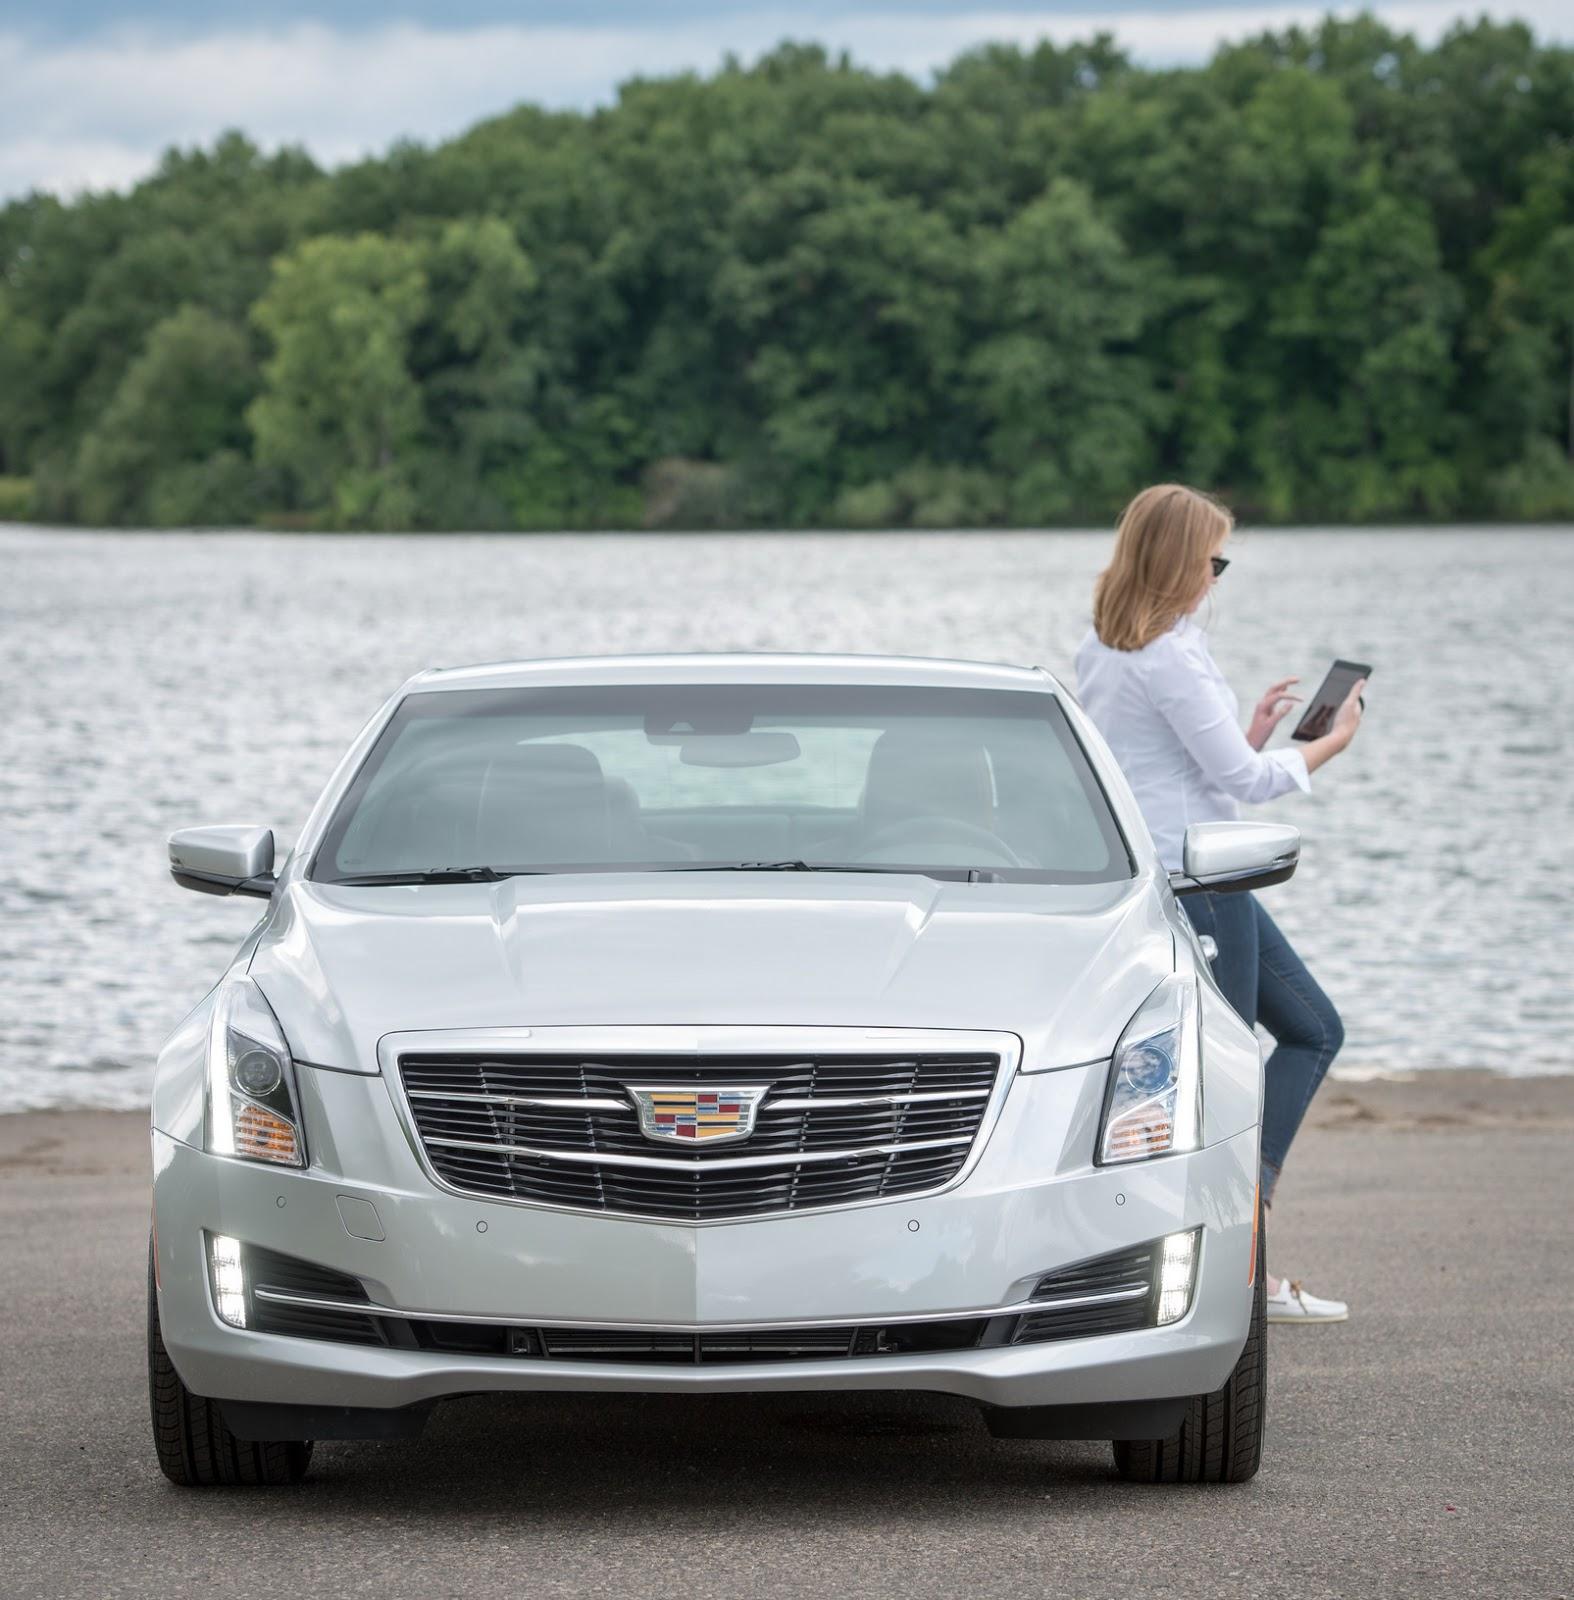 2015-Cadillac-ATScoupe-7.jpg